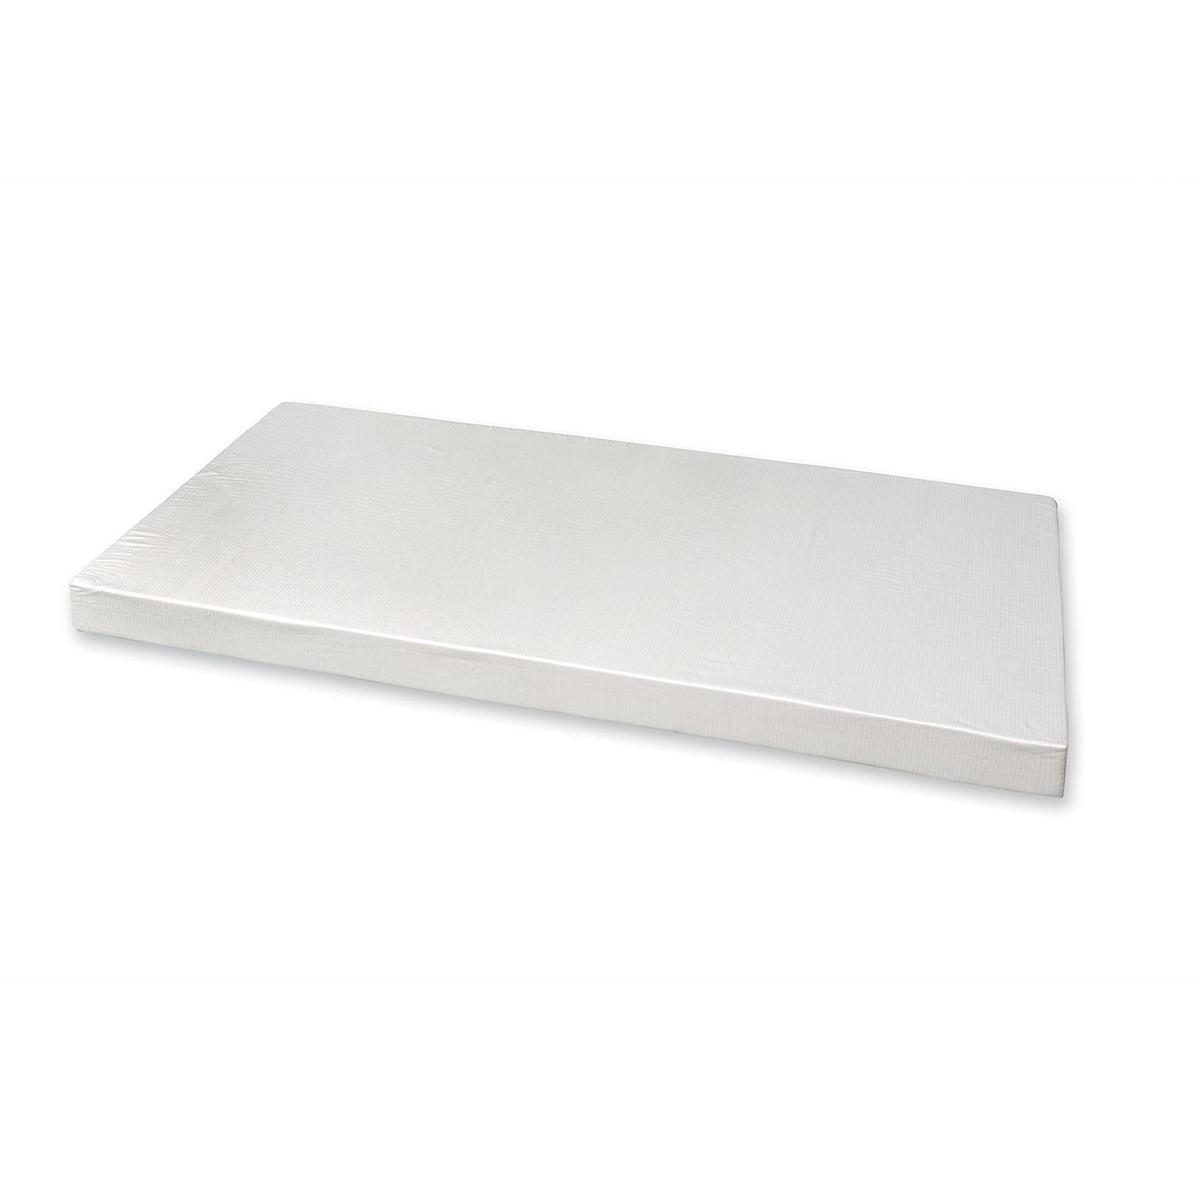 Matelas Tiroir lit gigogne 90x176cm SEASIDE Oliver Furniture